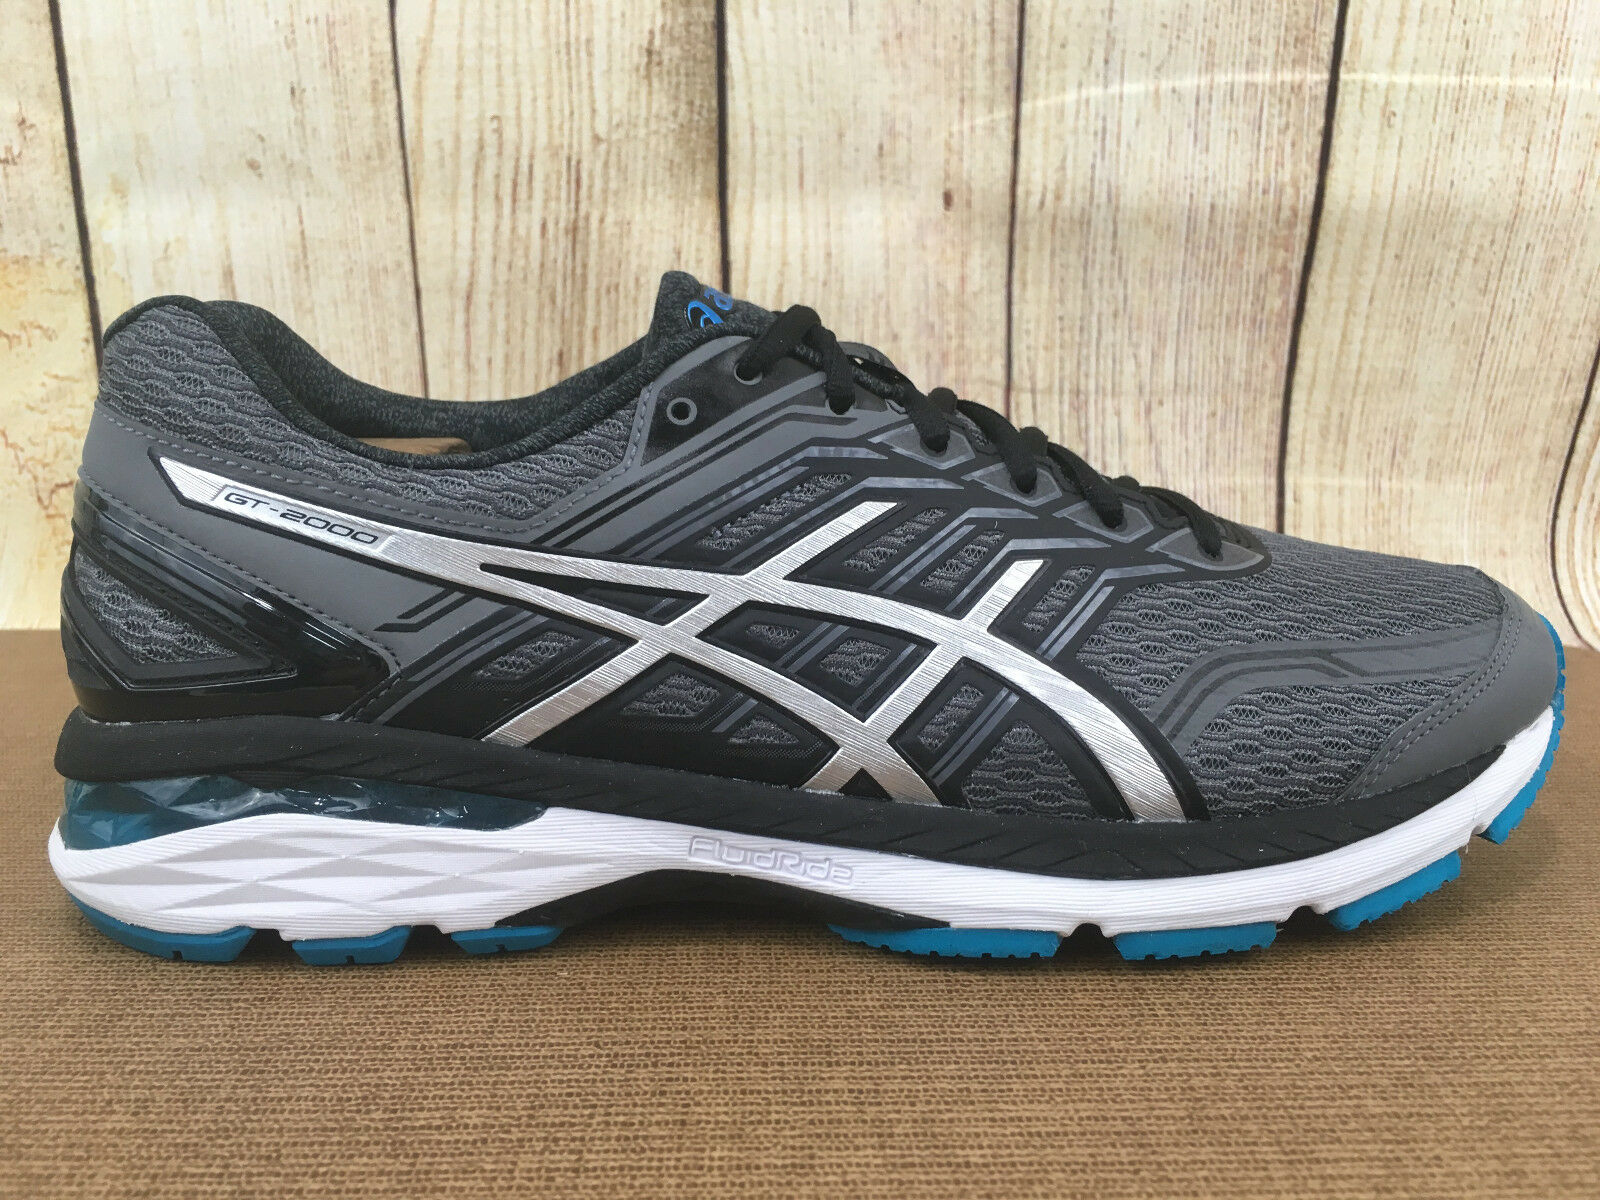 Asics Gt 2000 (T707N) Athletic Shoes - Men's Size 10, Black/Silver/Gray X12(10)